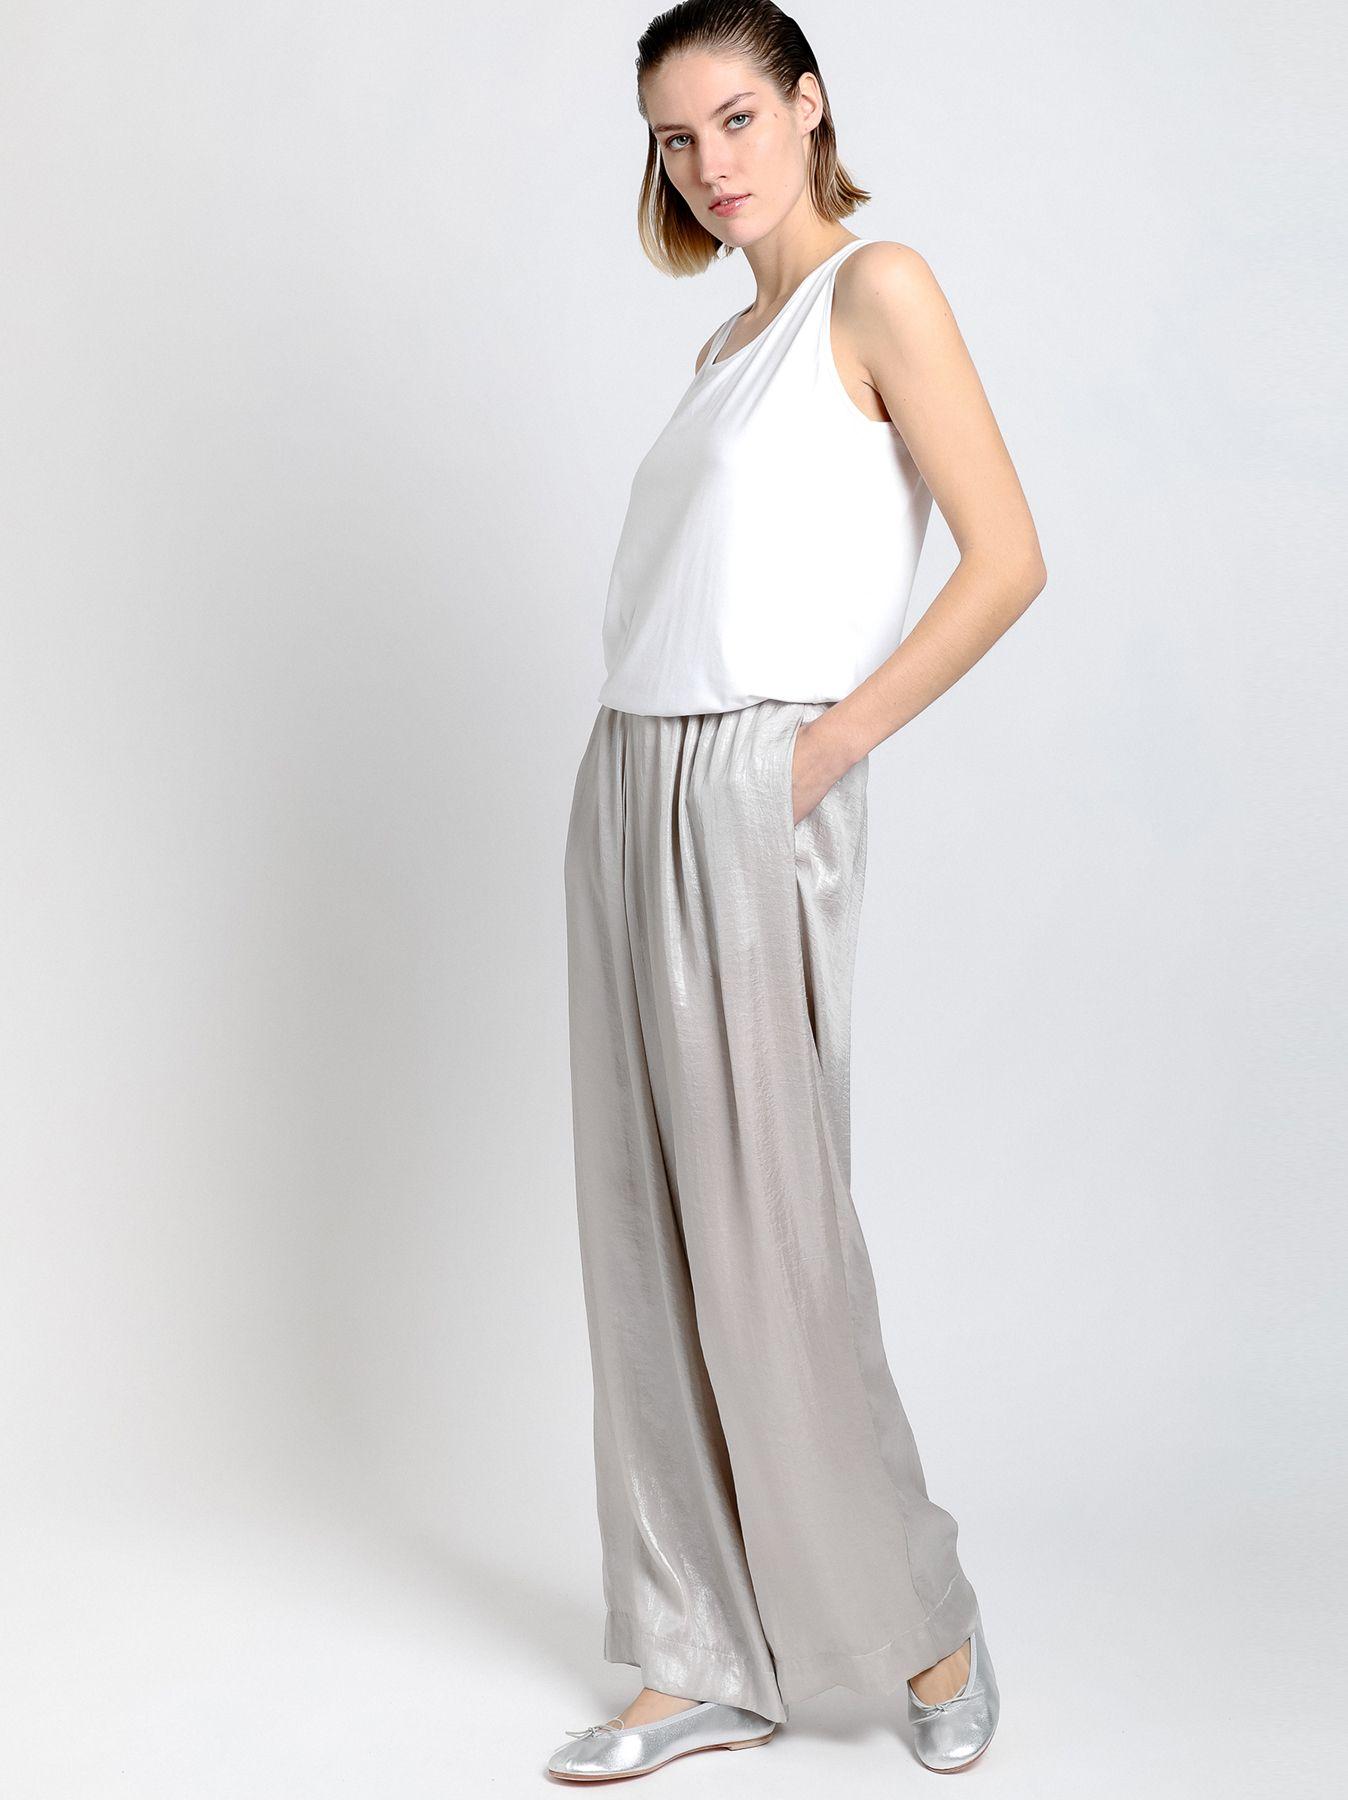 Pantalone elastico in tessuto spalmato